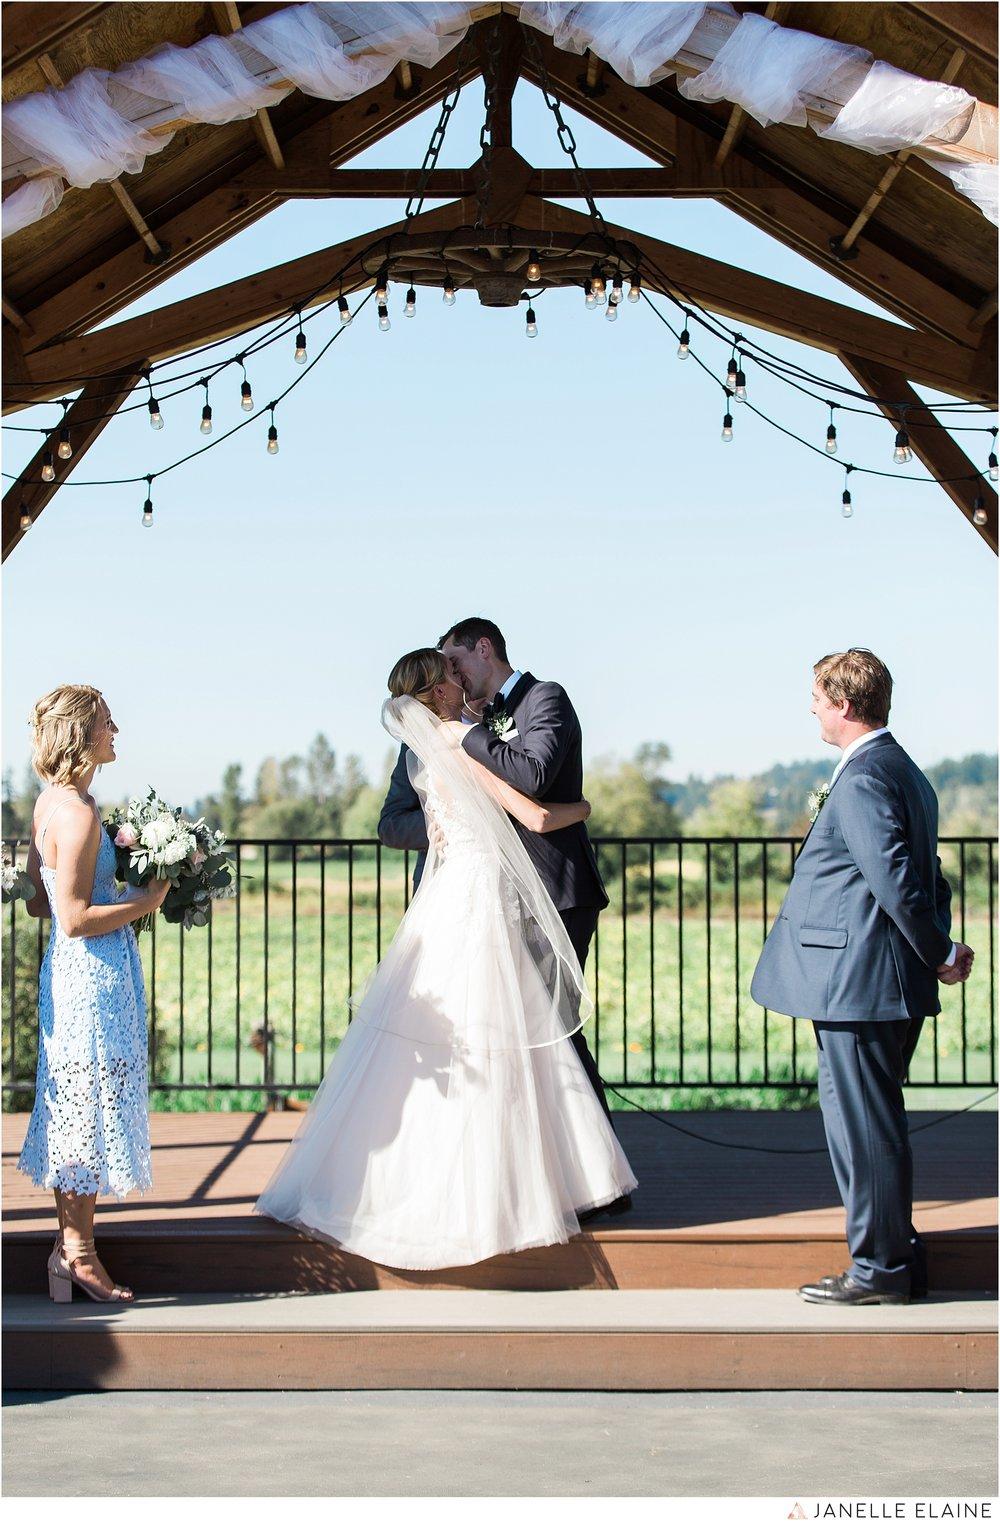 janelle elaine photography-carleton farms-washington-wedding-lake stevens-225.jpg